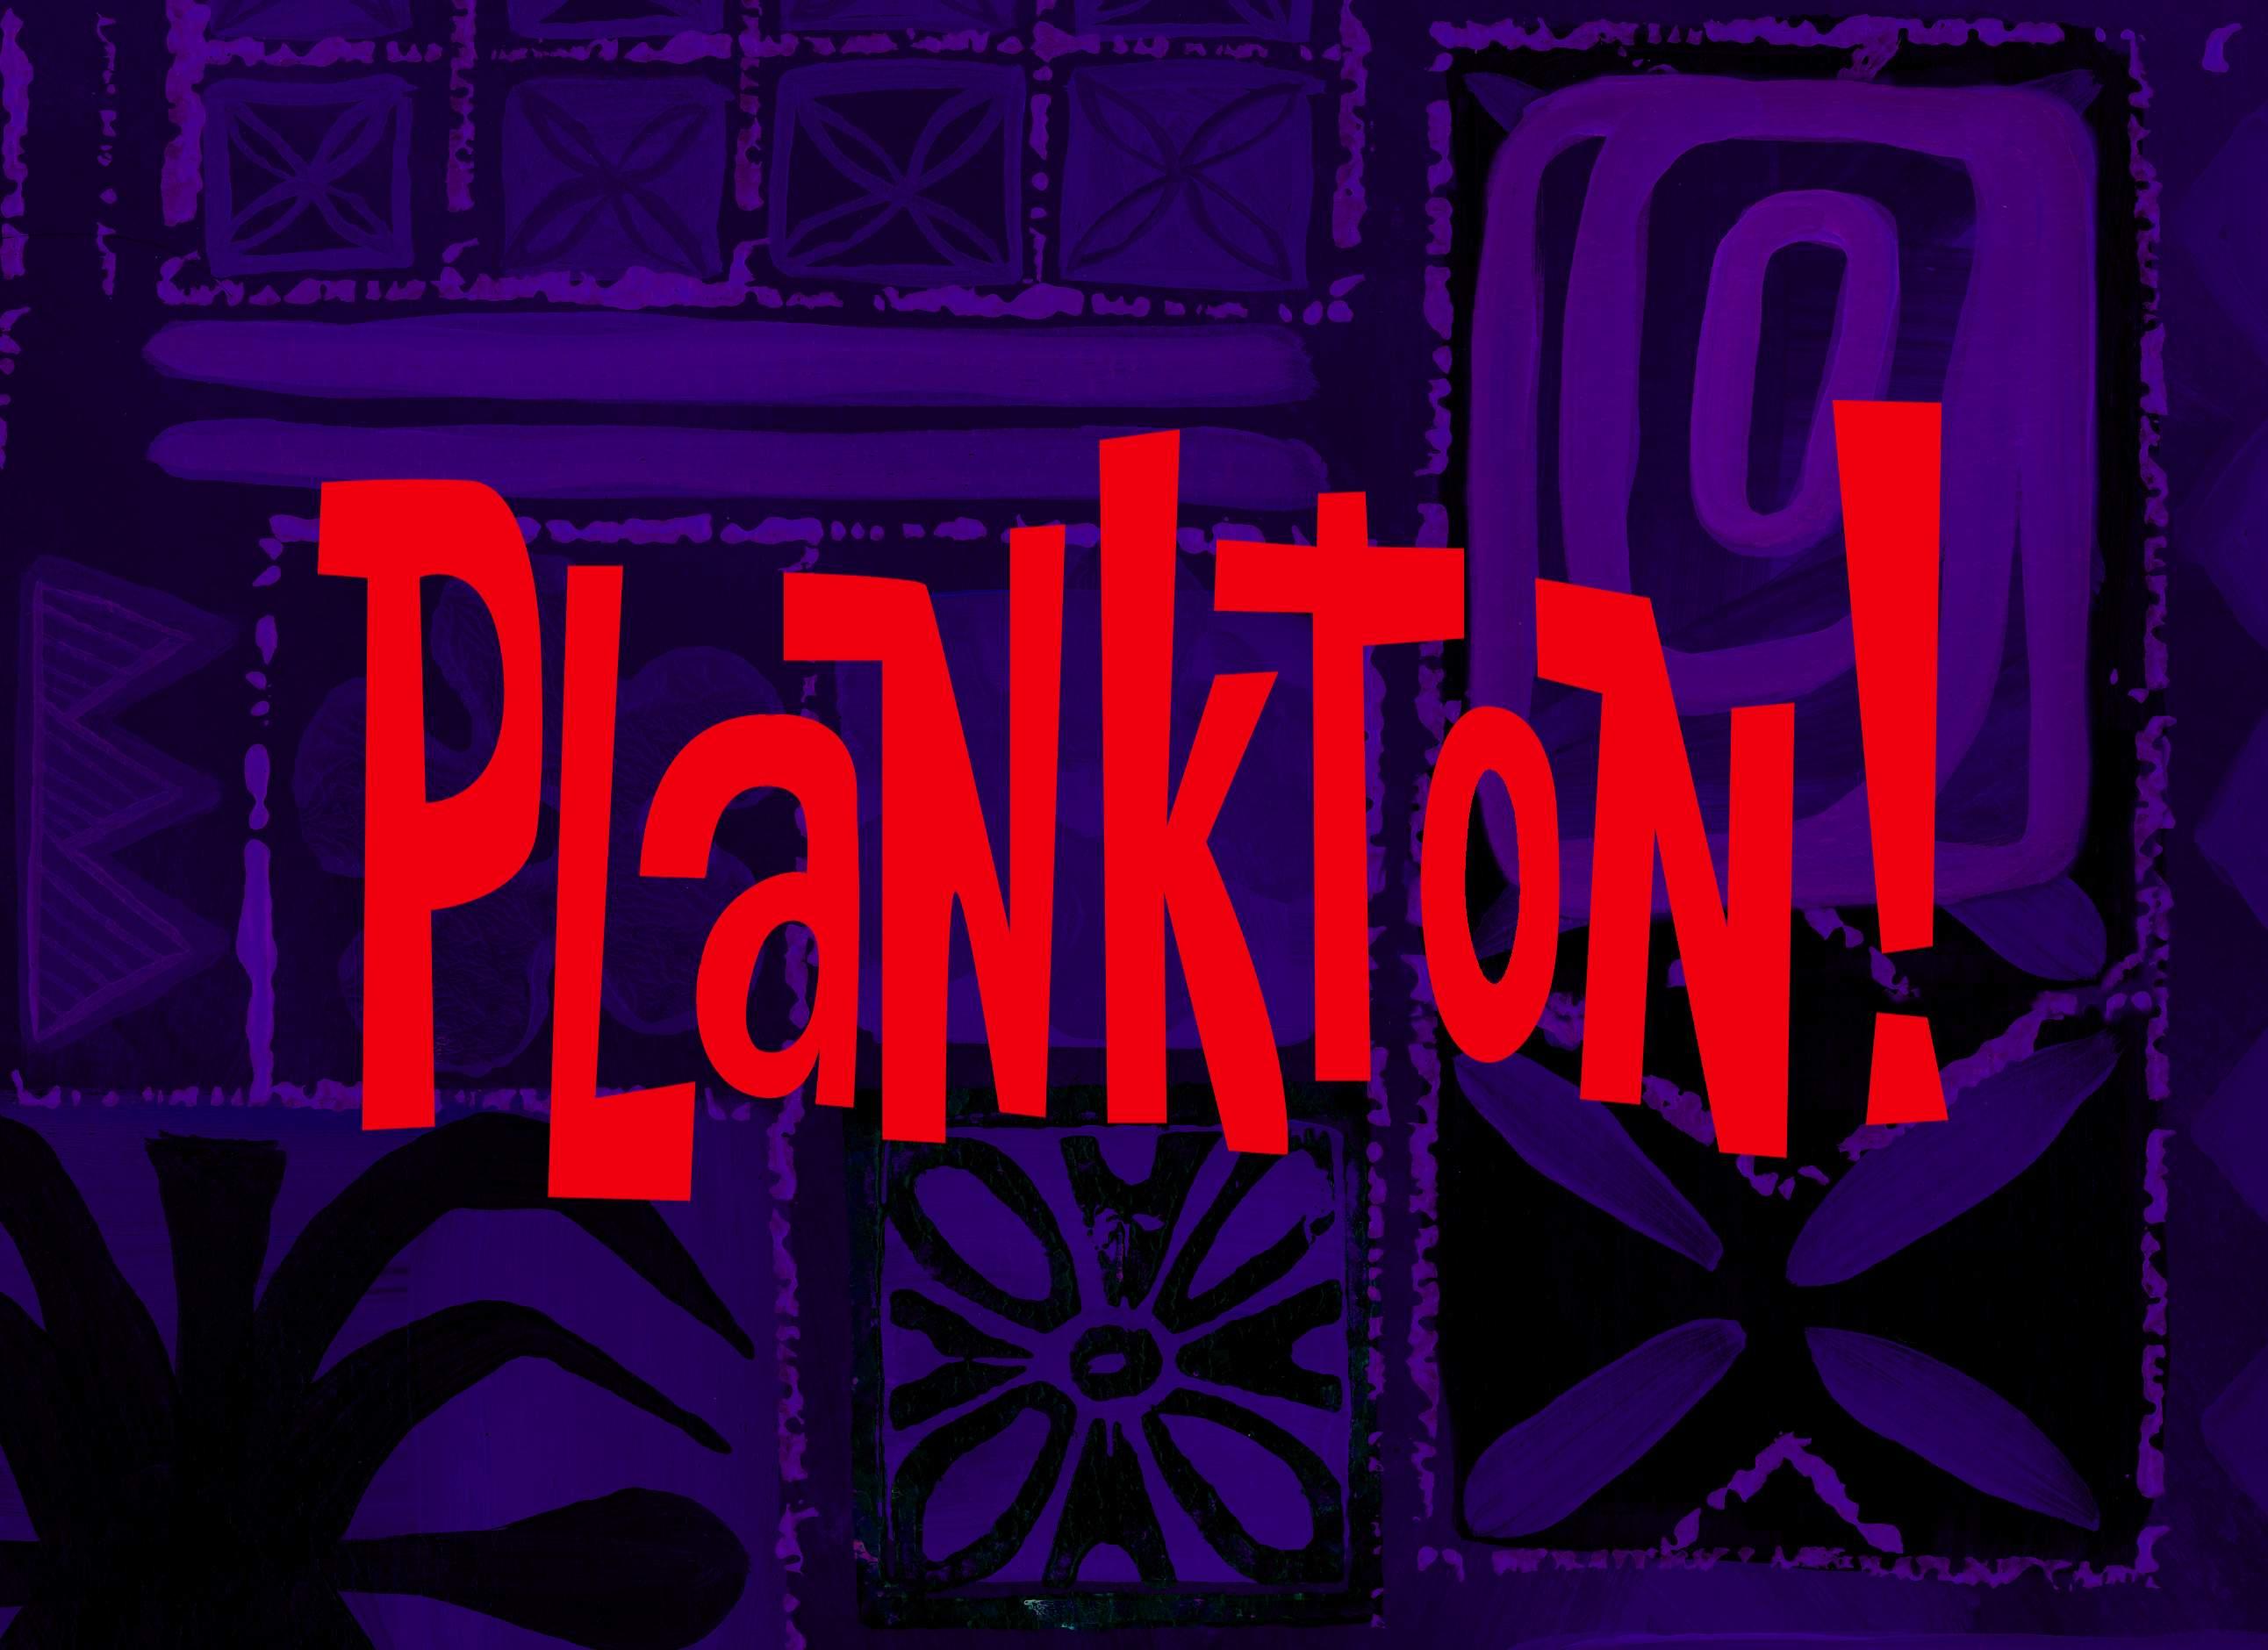 Splat plankton